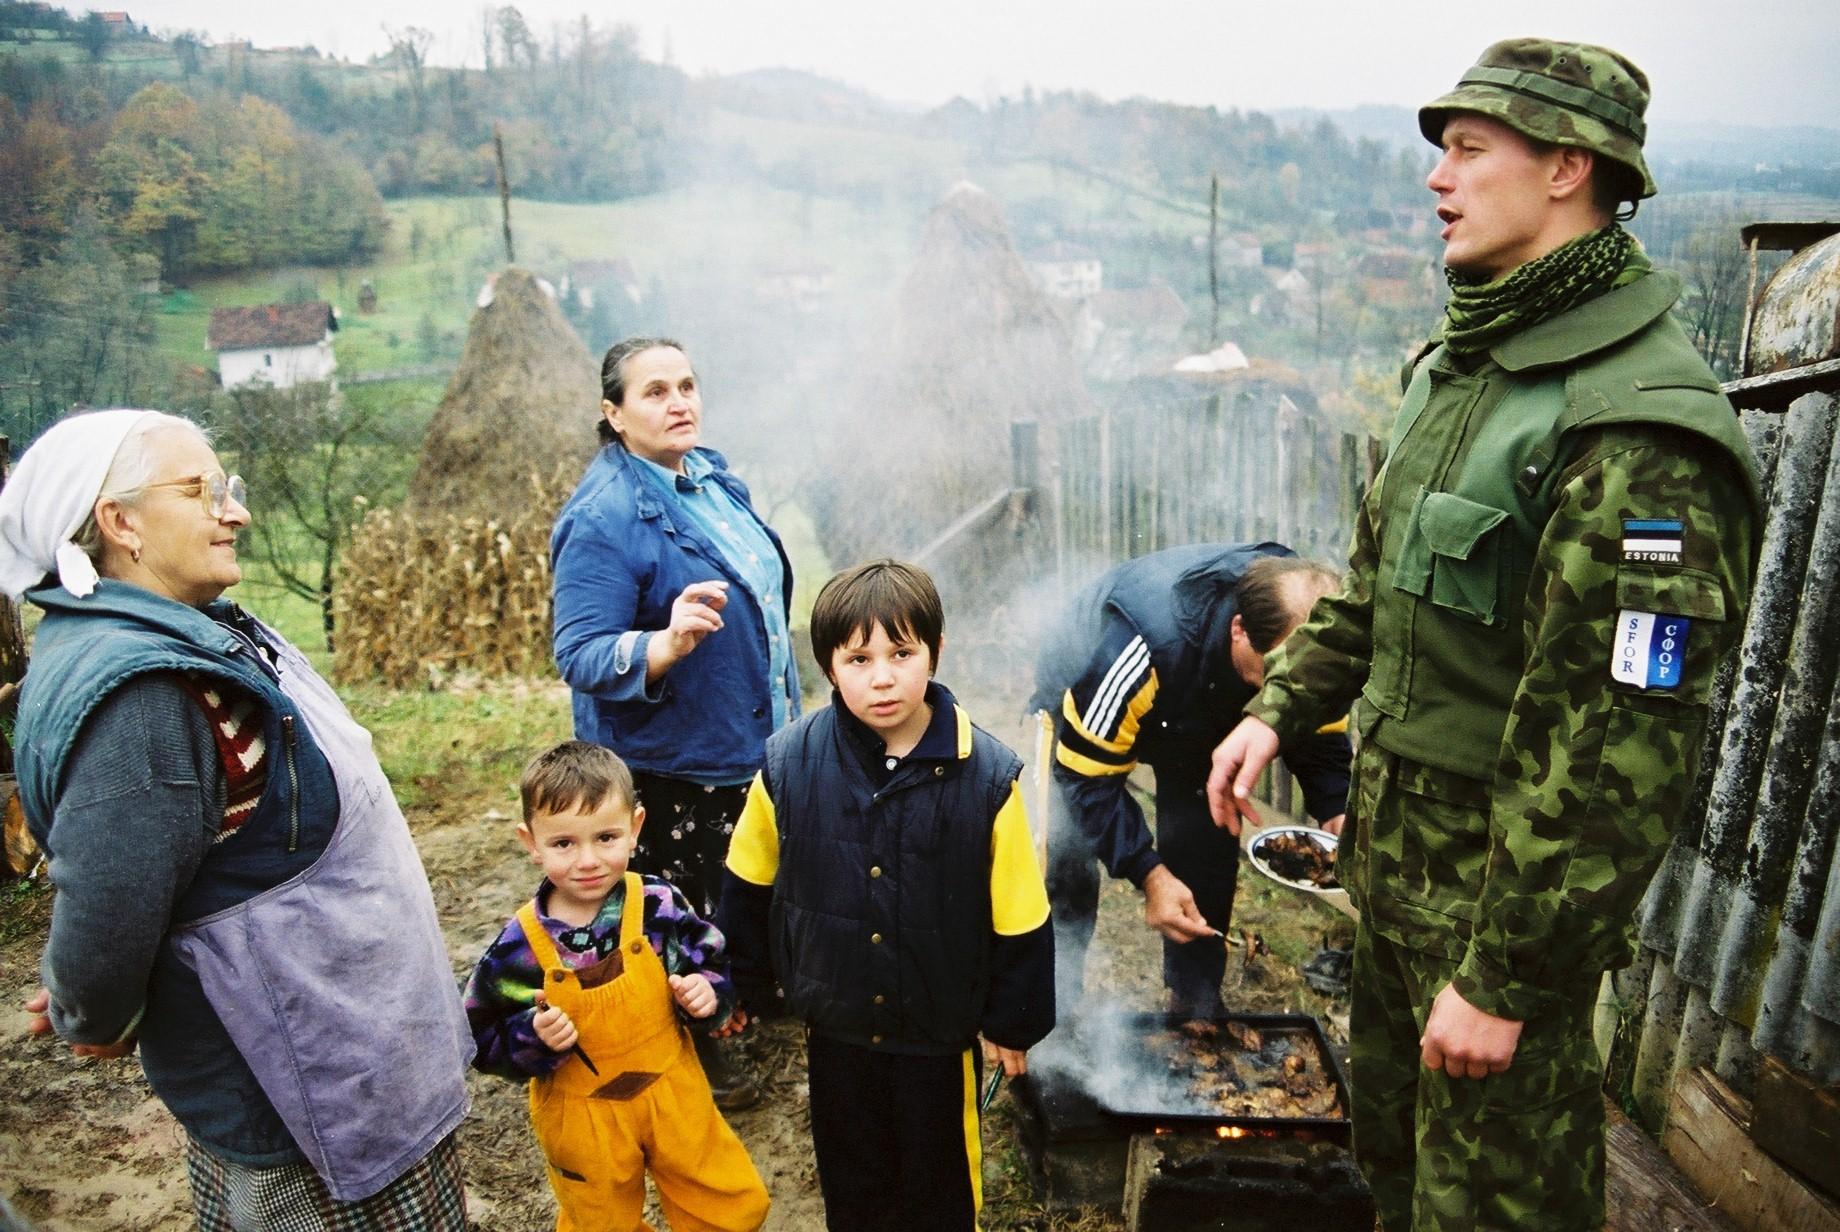 Eesti sõdur Bosnias. Foto: Ants Laaneotsa erakogu